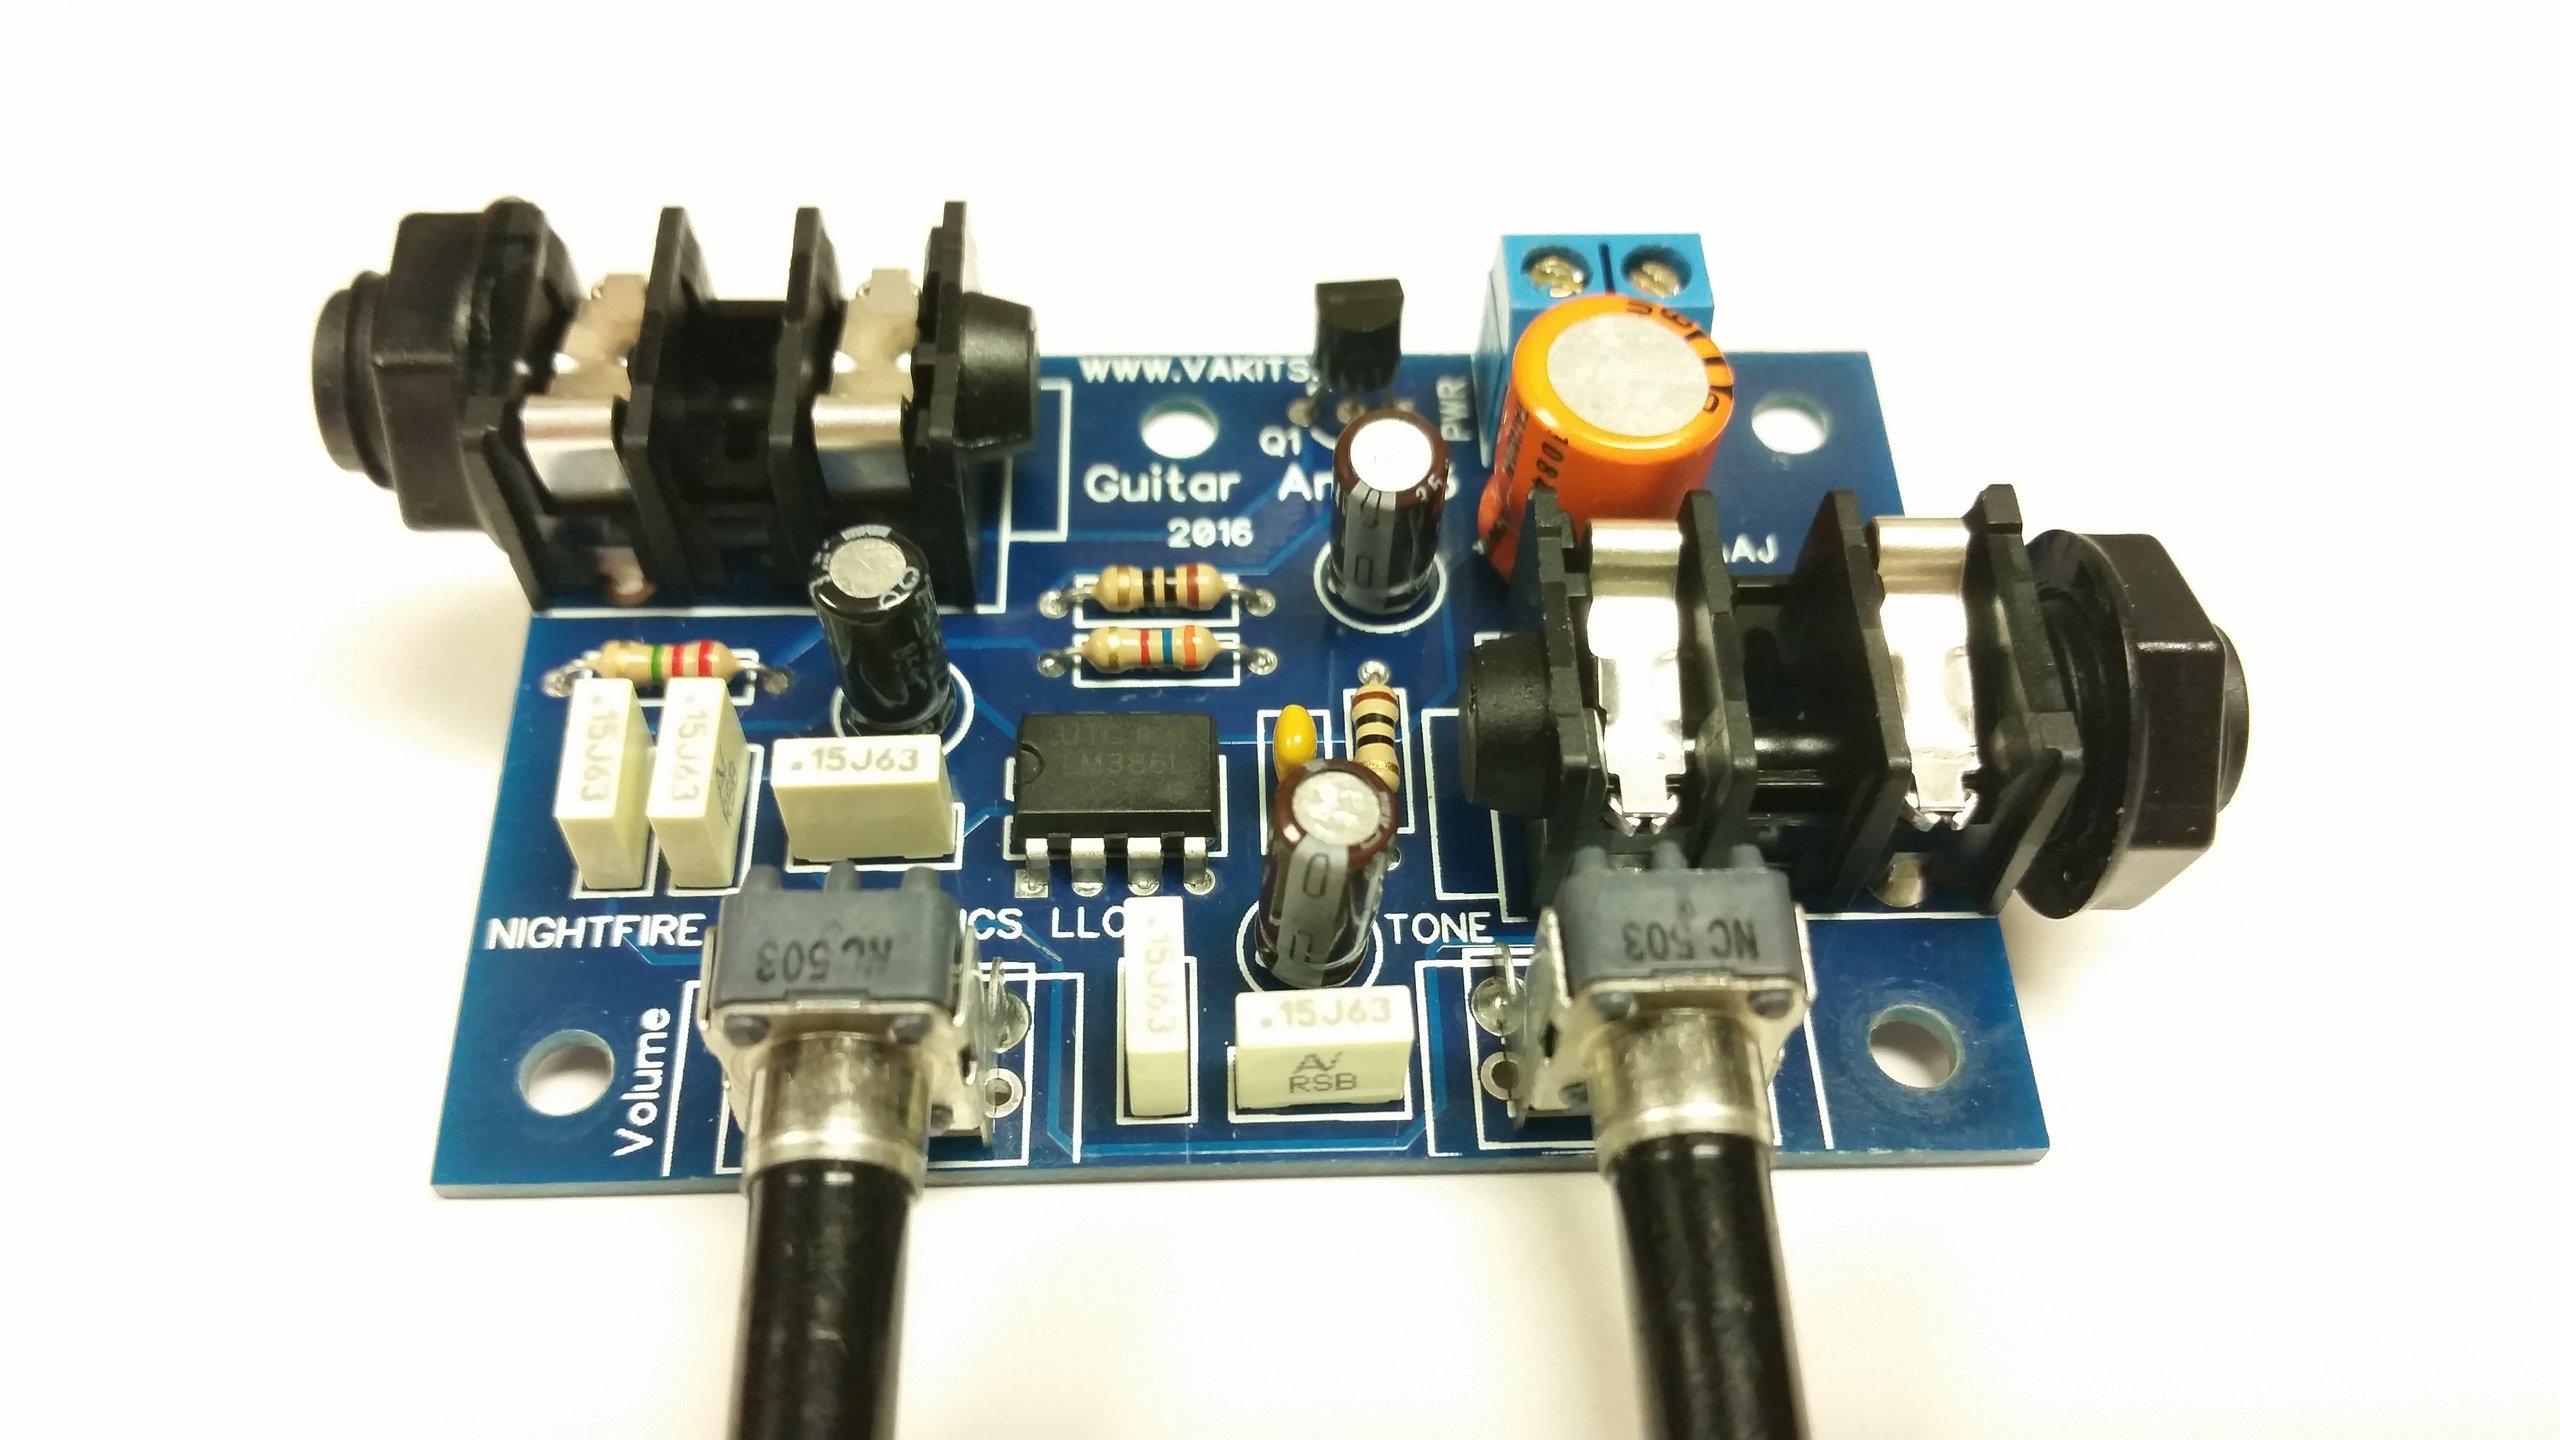 guitar mini amplifier kit 1127 from nfceramics on tindie. Black Bedroom Furniture Sets. Home Design Ideas